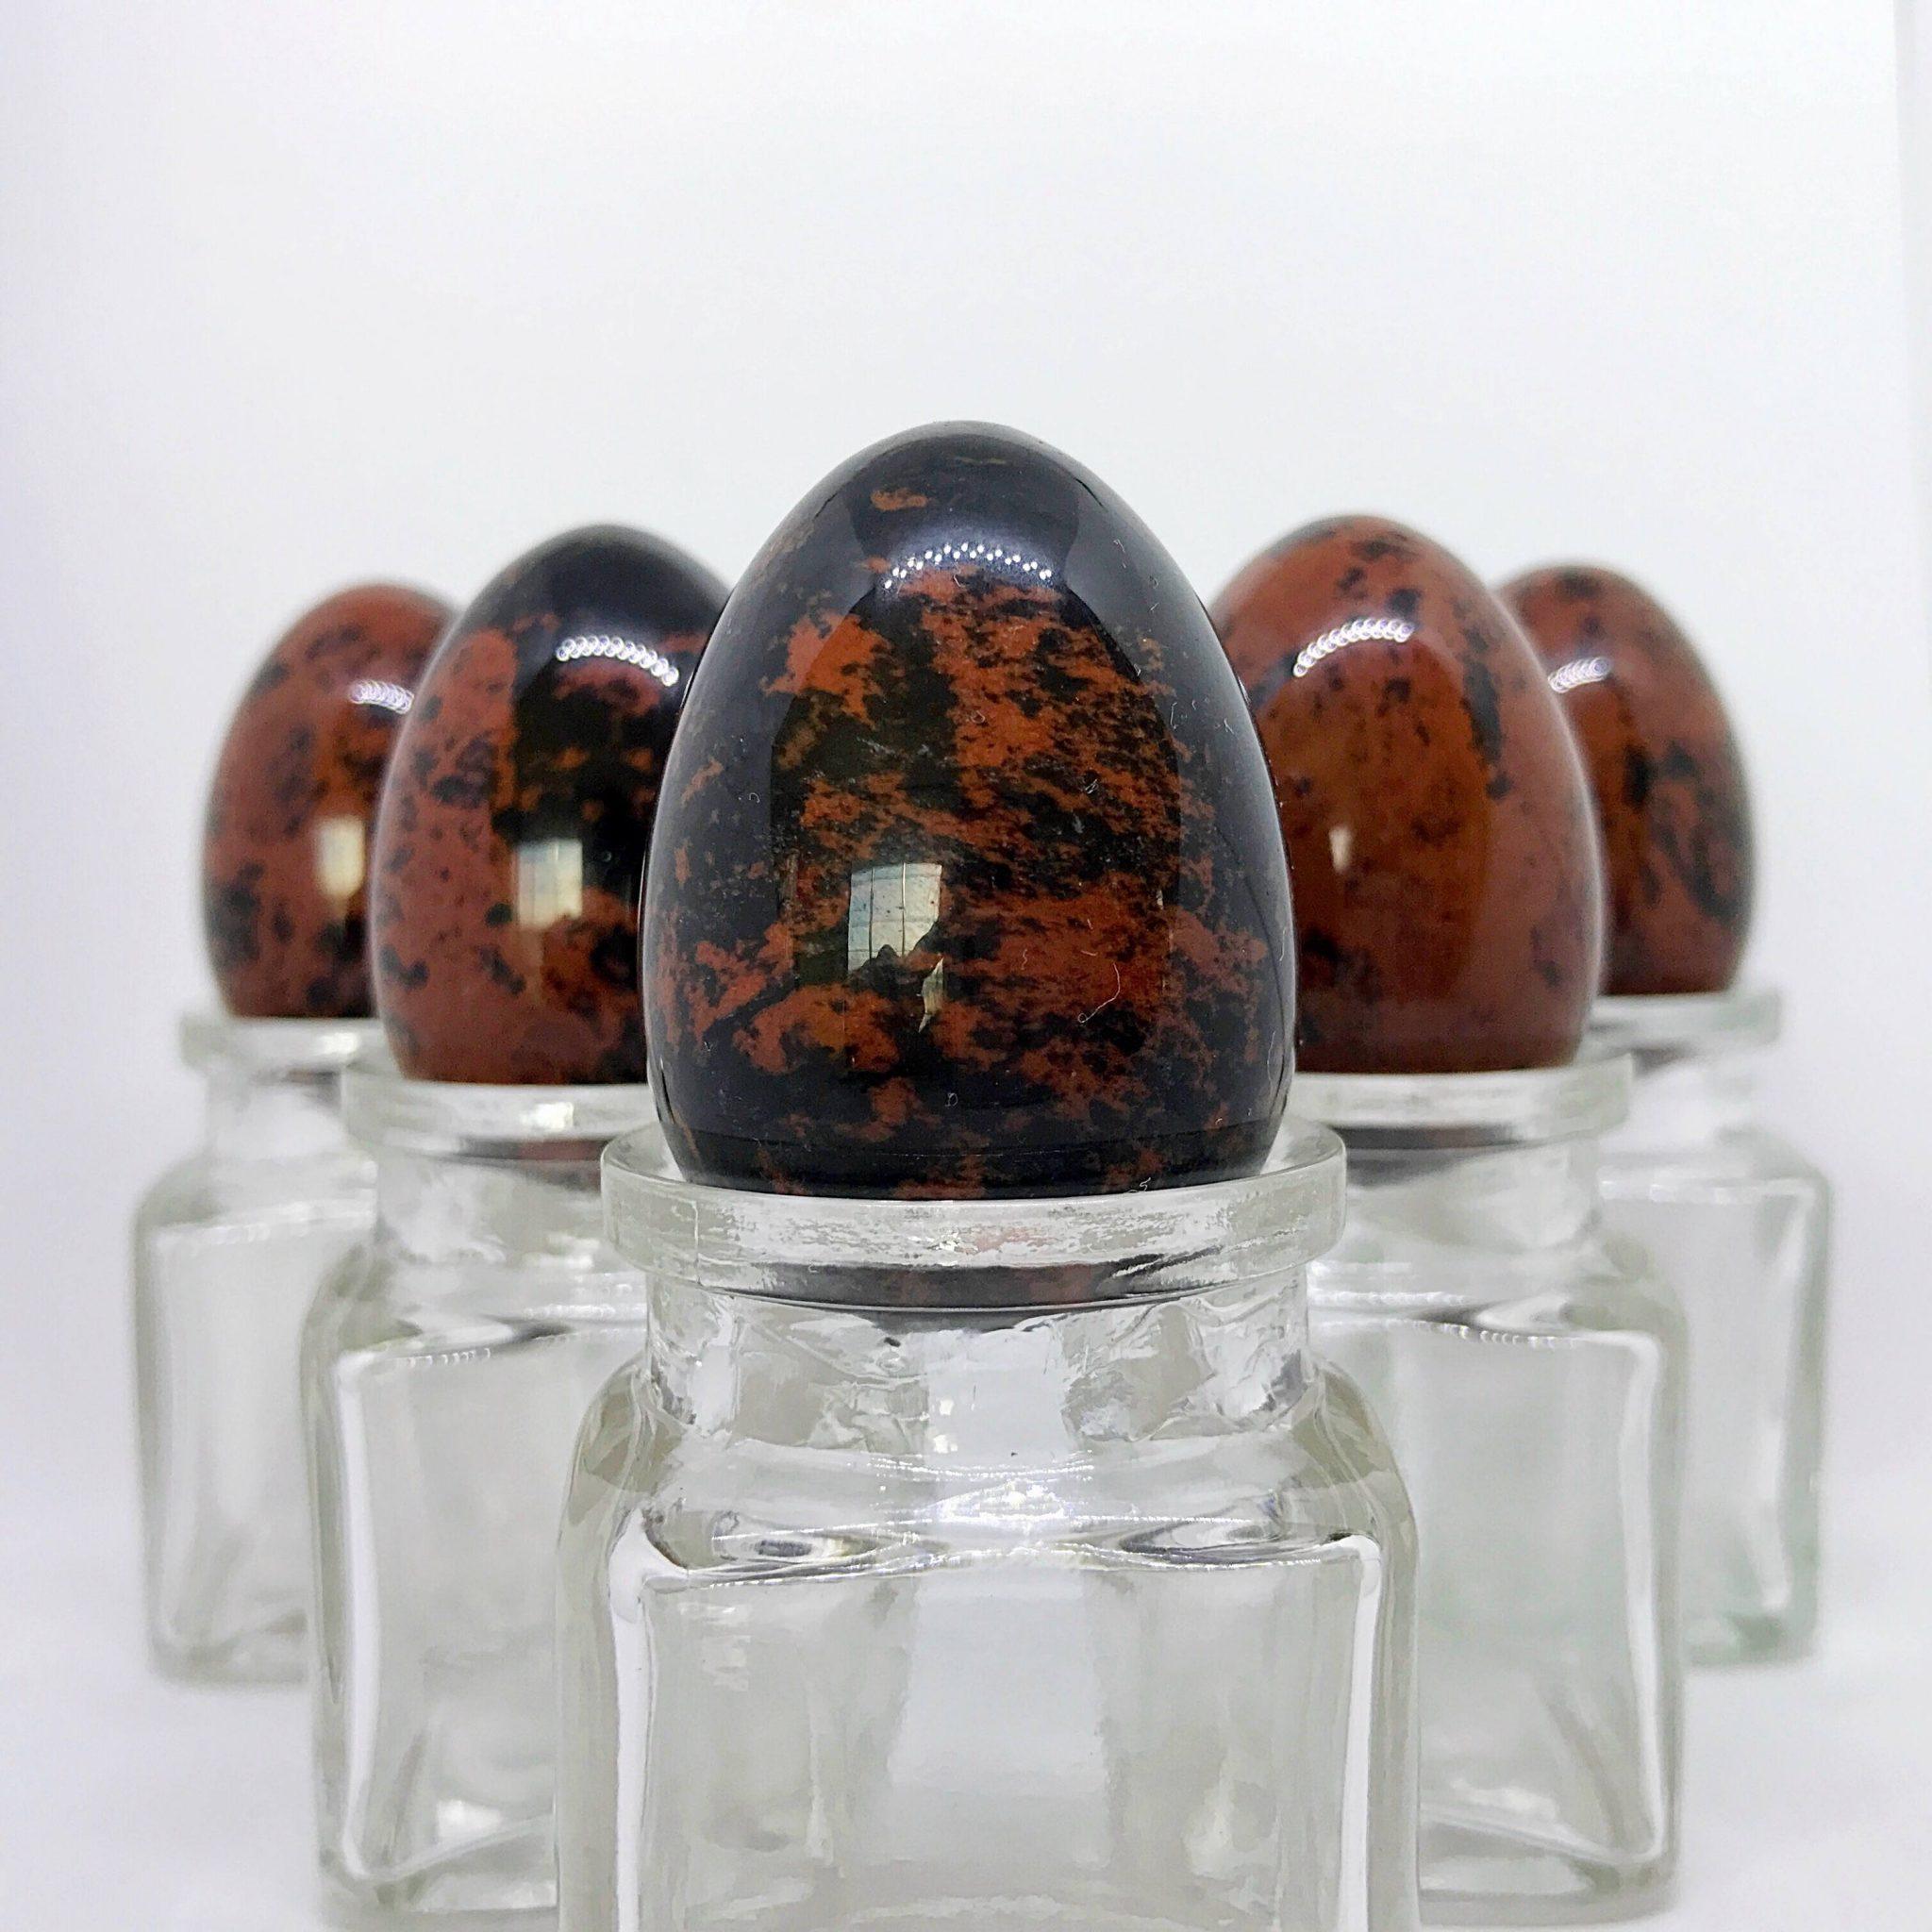 5 Medium, nondrilled Mahogany Jasper Yoni Eggs